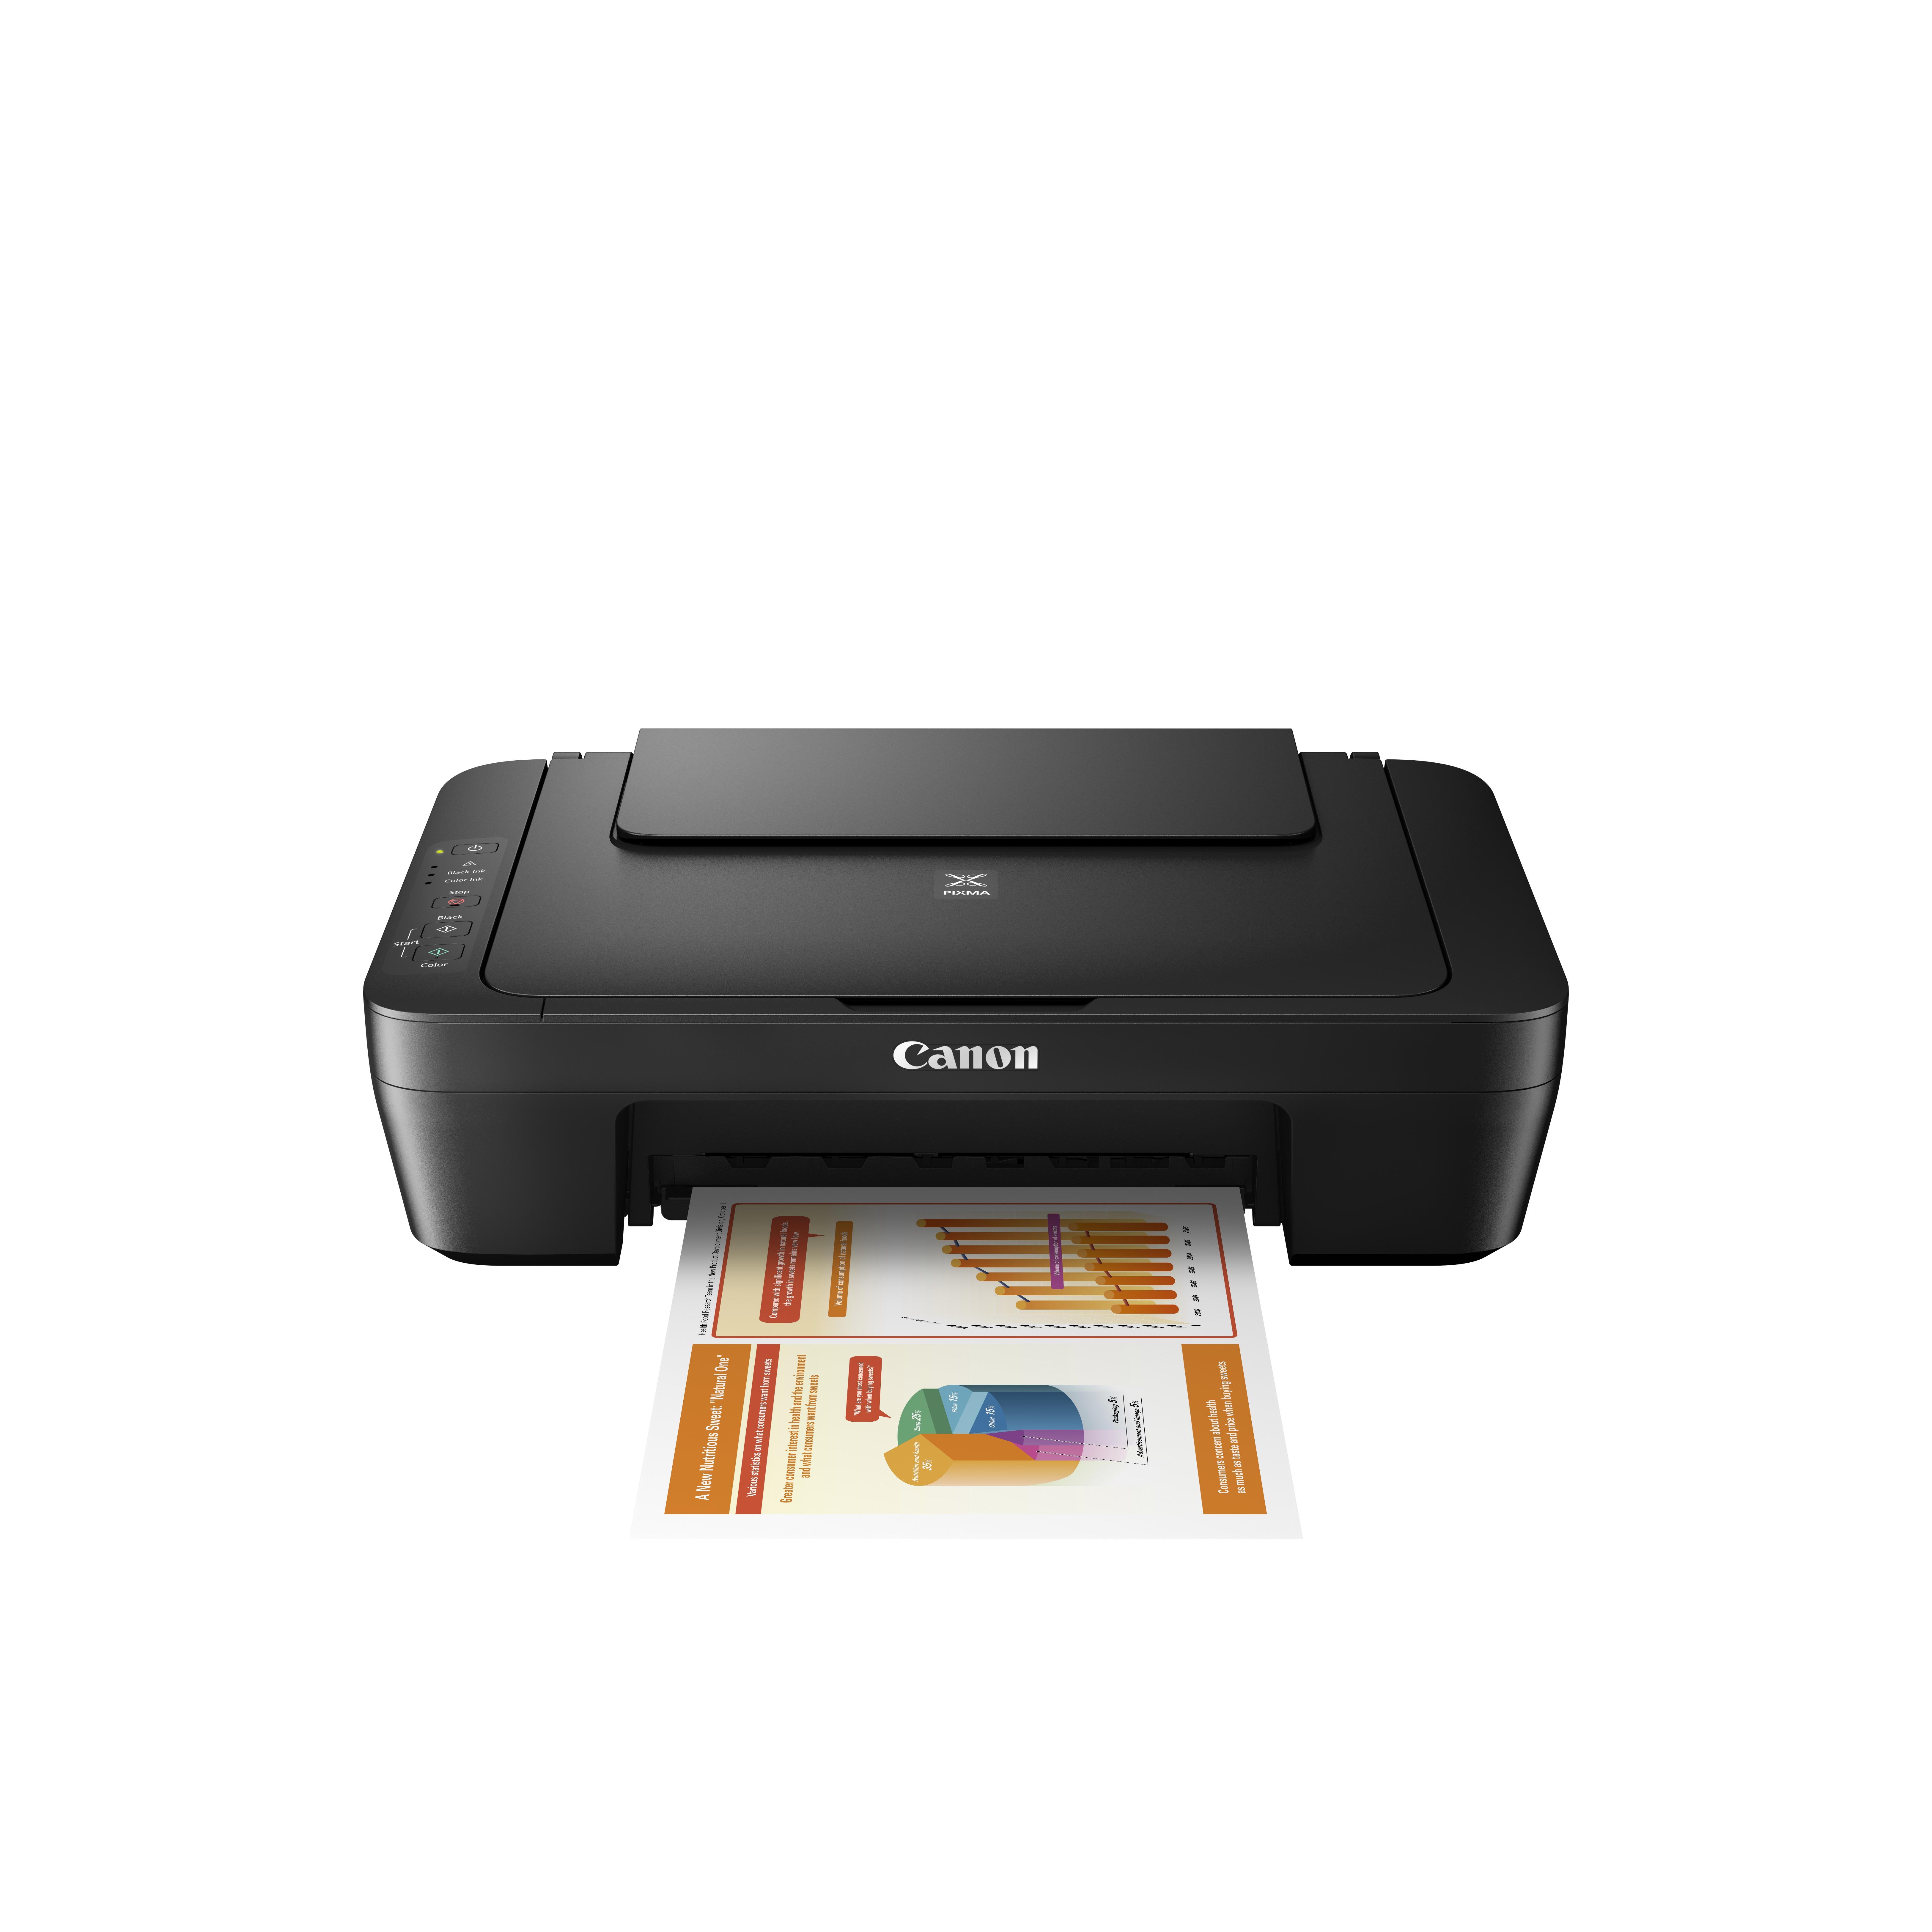 Canon-0727C006-PIXMA-MG2550S-Inkjet-4800-x-600-DPI-A4-Printer-Scanner-Copier